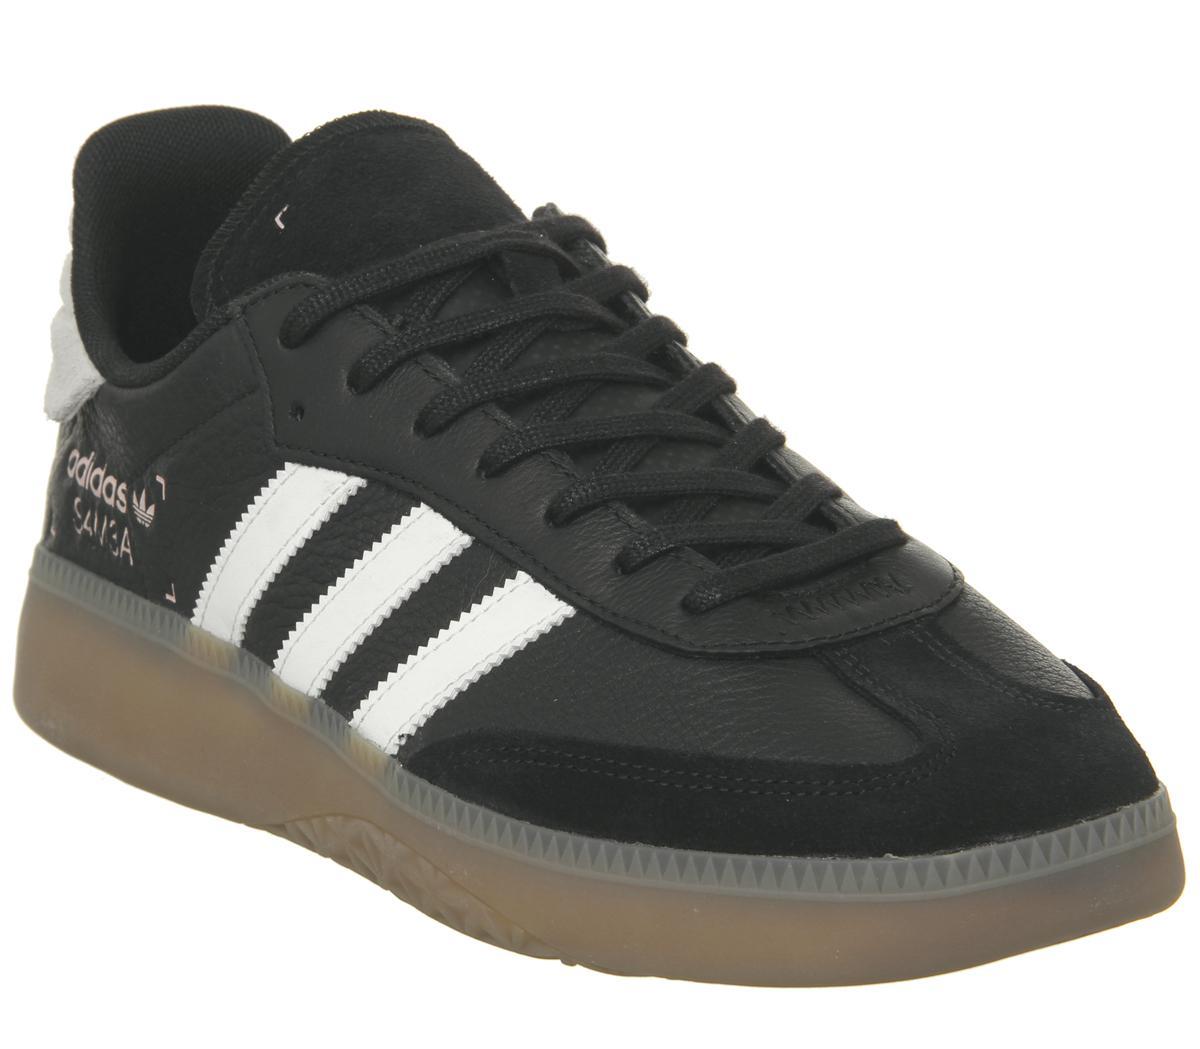 on sale e1ff8 58224 adidas. Mens Black Samba Rm Trainers